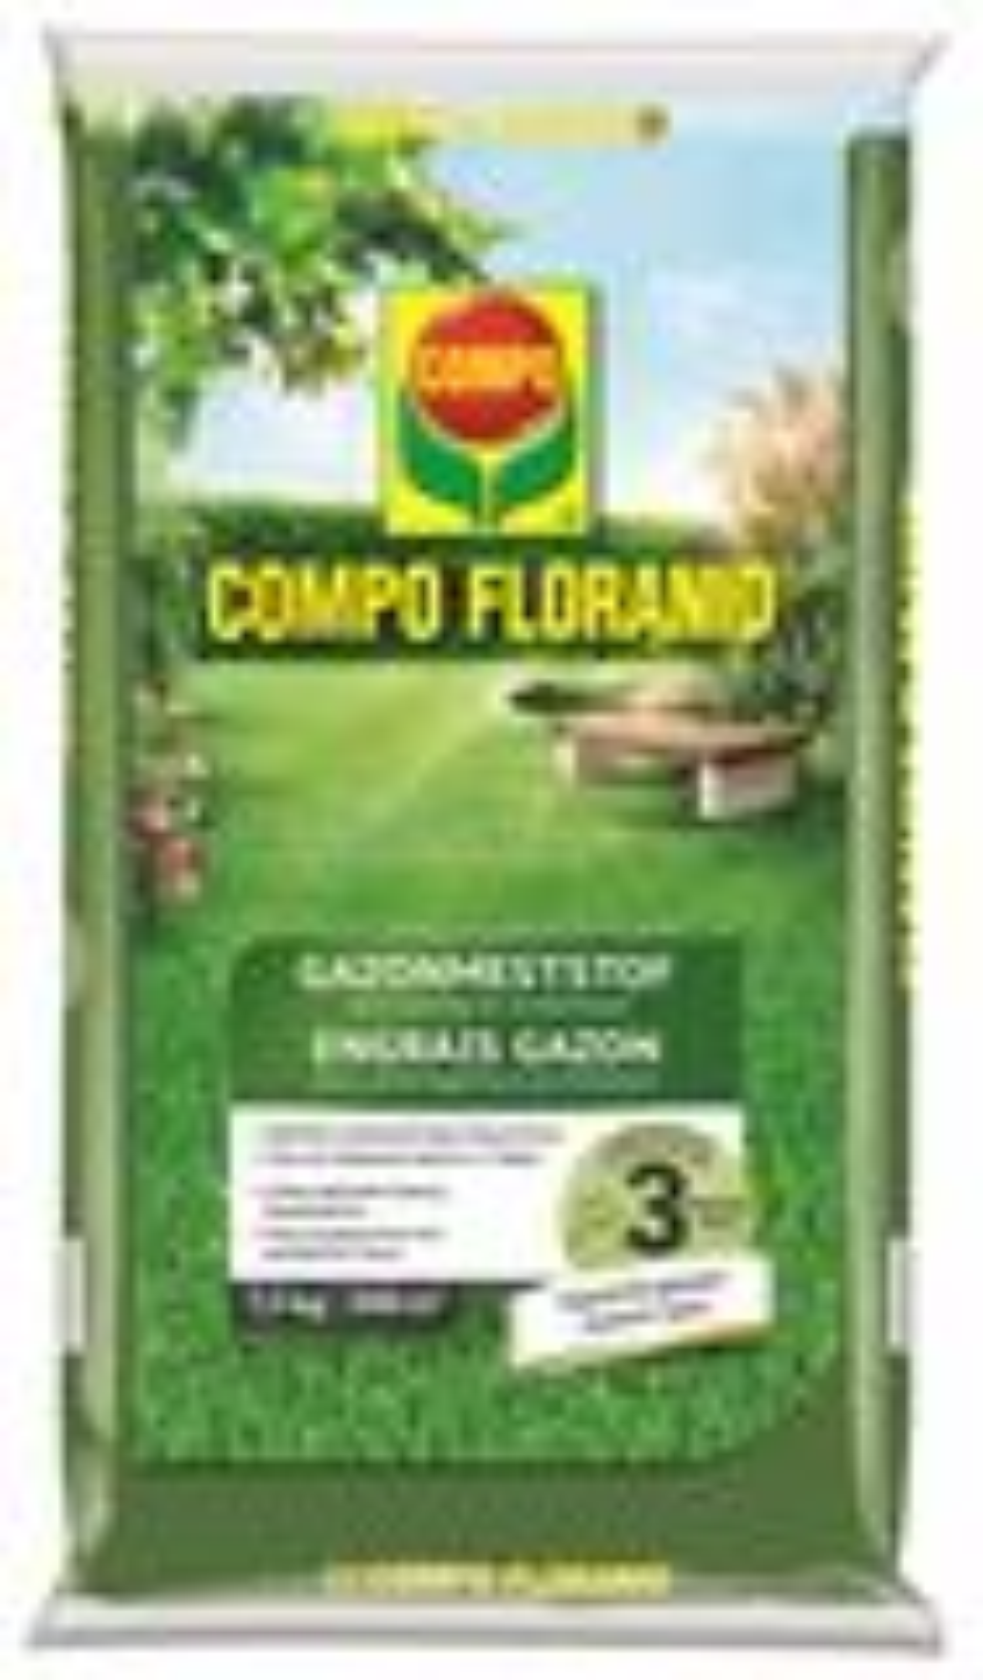 Compo floranid gazonmeststof 7,5kg